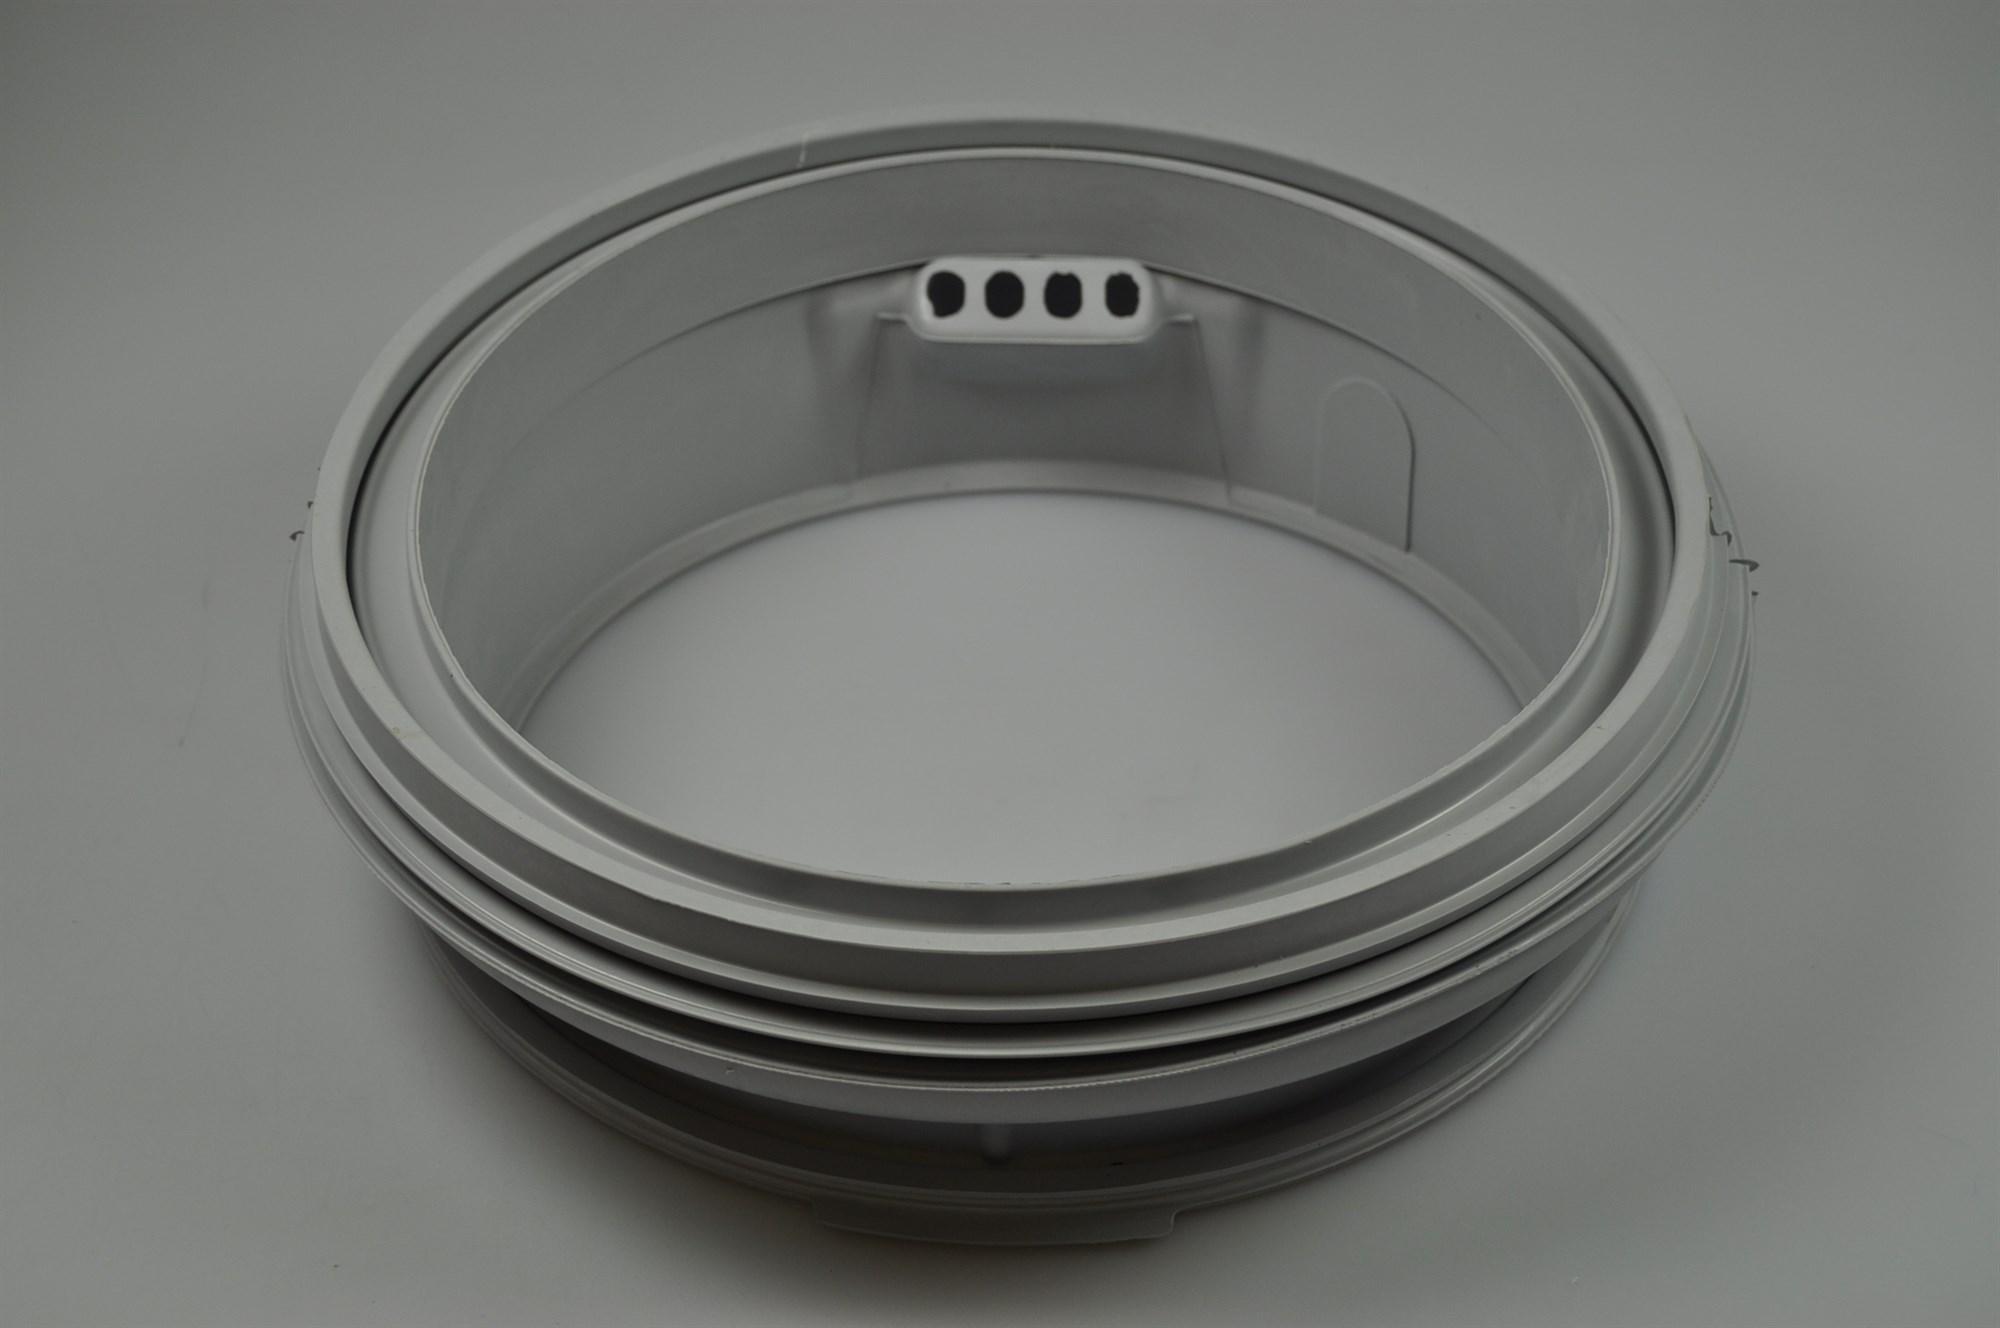 Door Seal Aeg Washing Machine Rubber